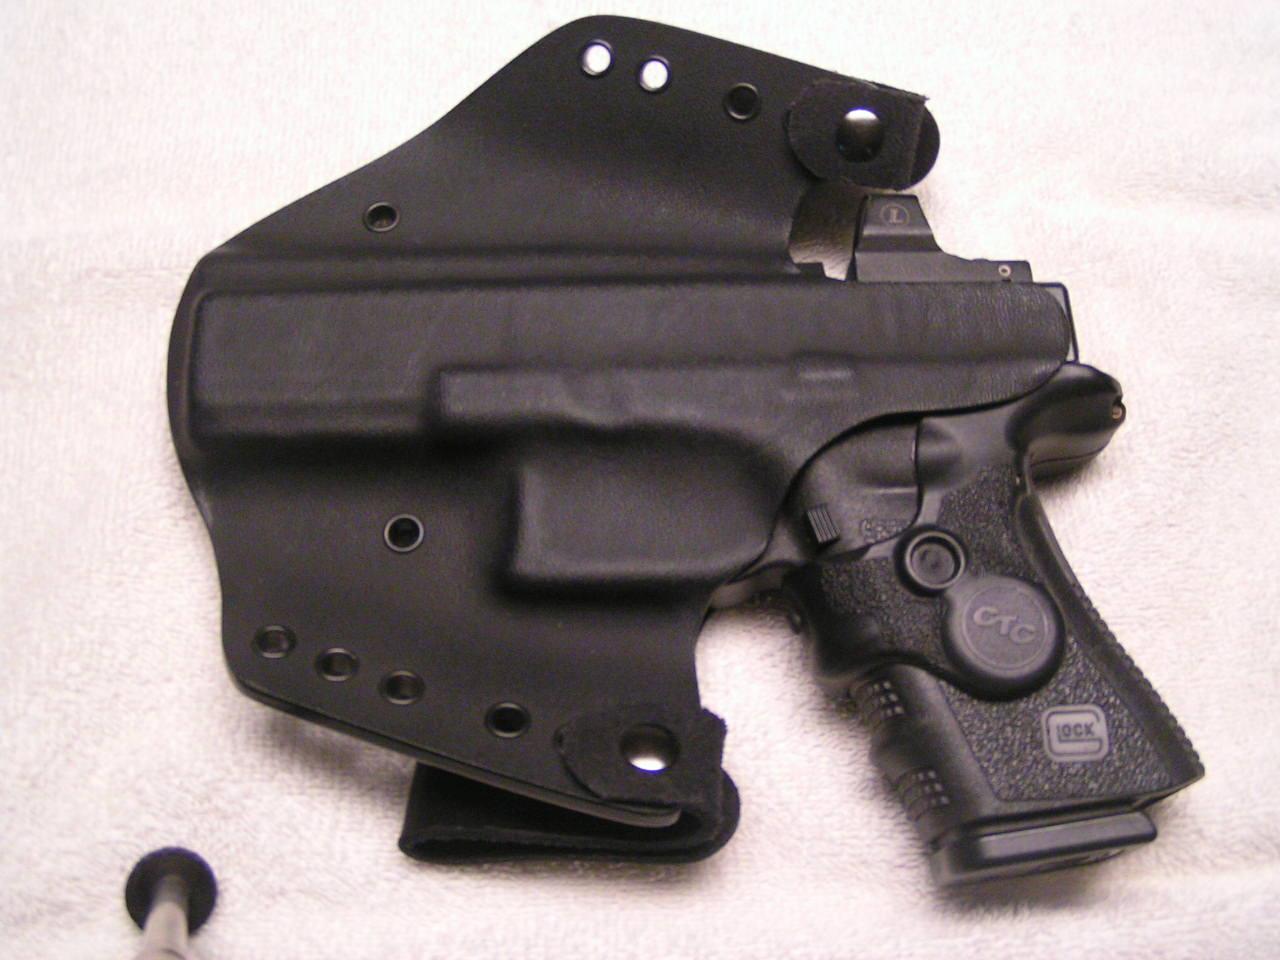 New product! AIWB-midworld-17-holster-001.jpg